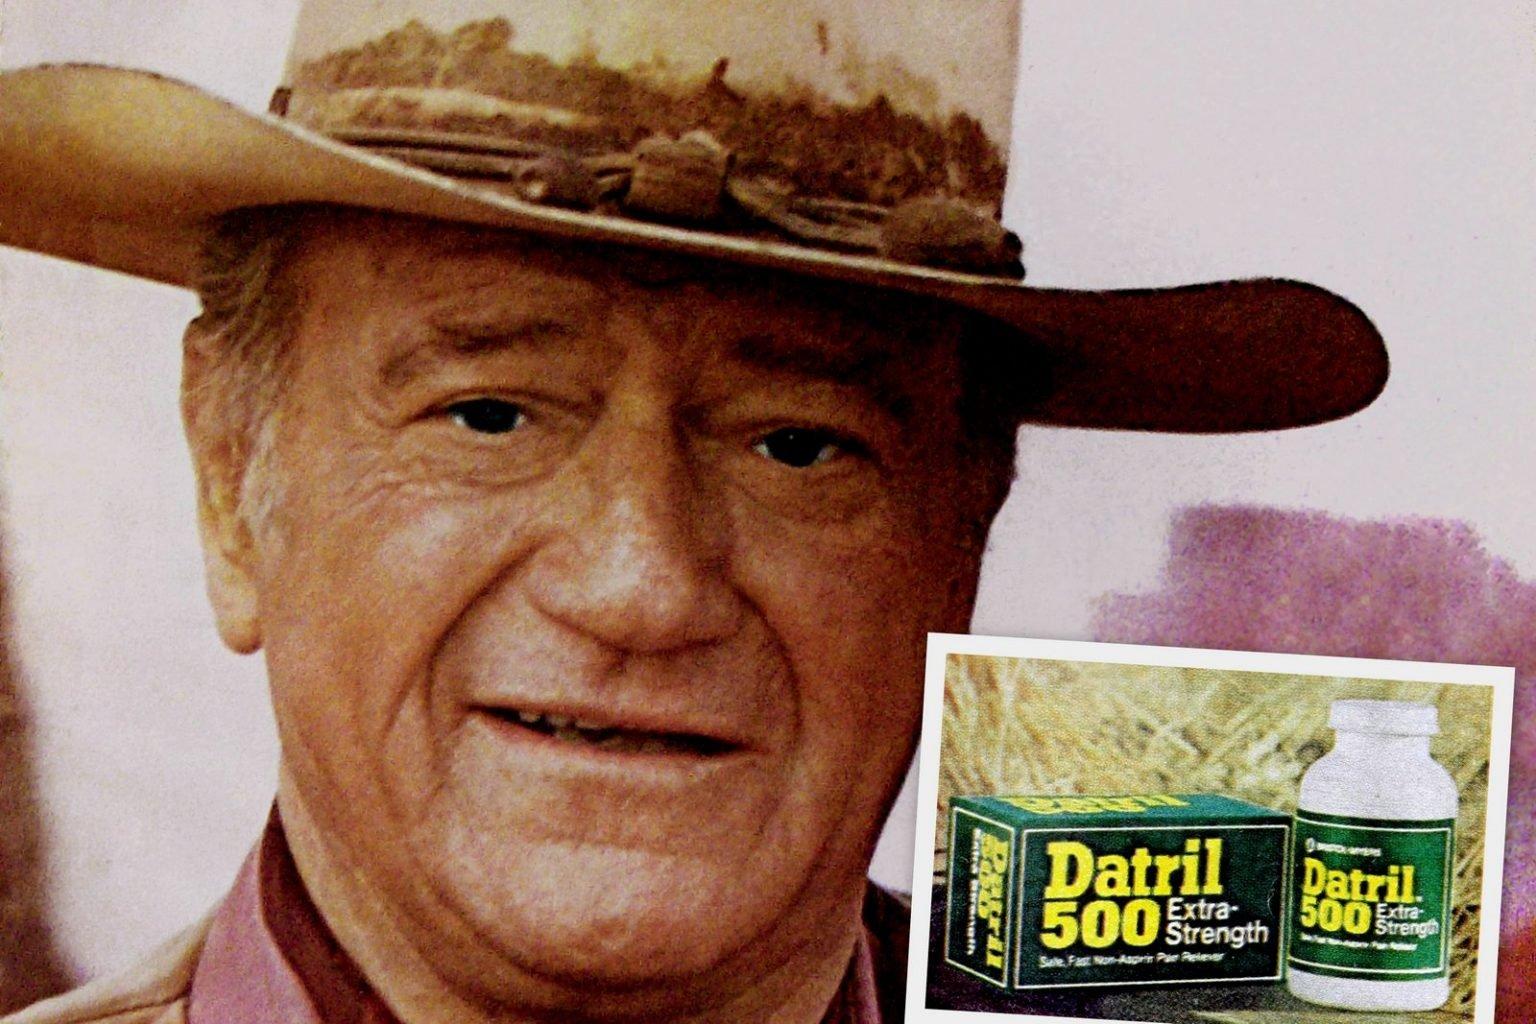 John Wayne introduced Datril 500 pain reliever (1970s)